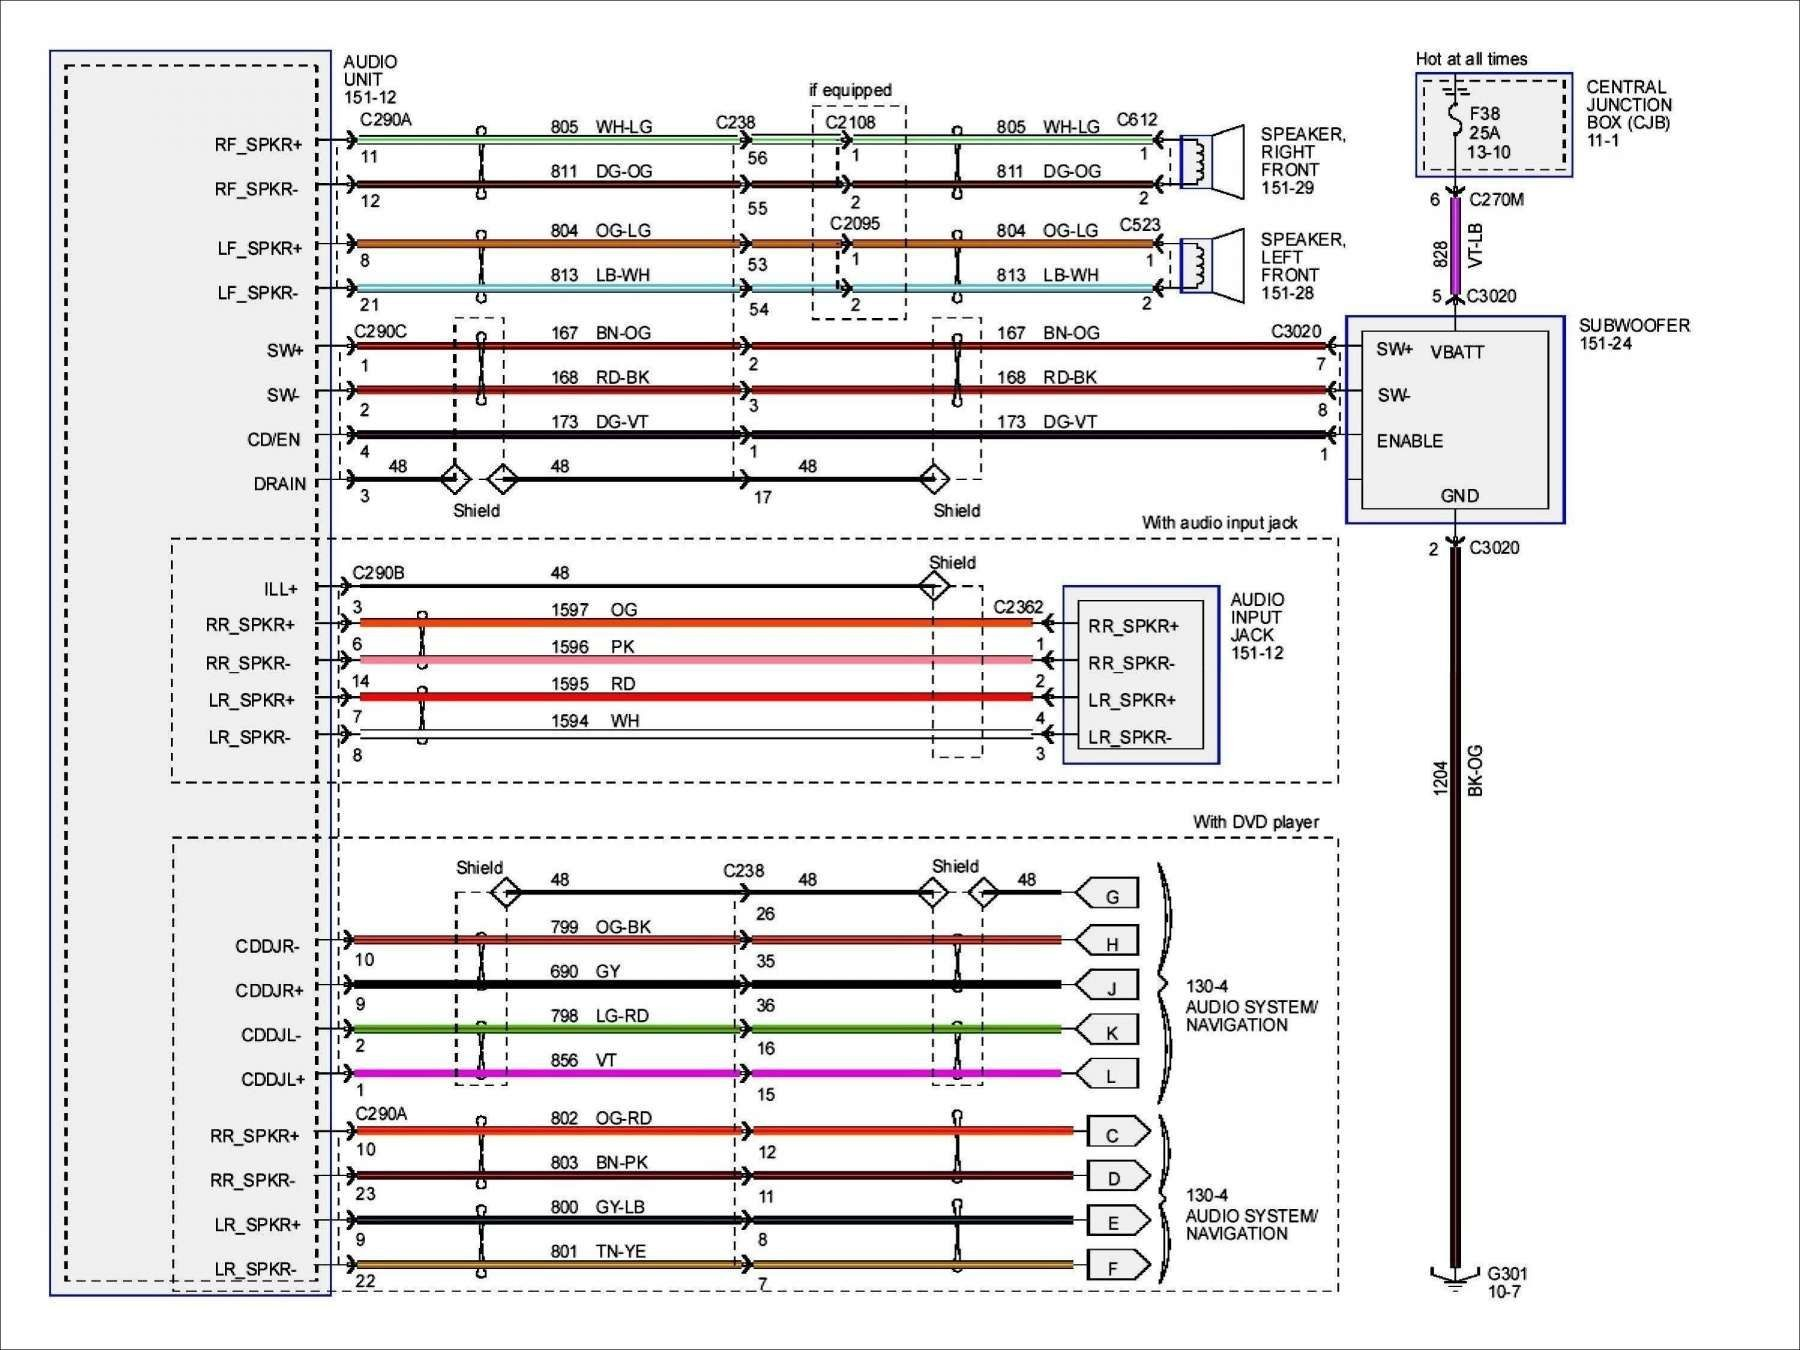 2005 Dodge Ram Infinity Radio Wiring Diagram 2006 Dodge Ram Stereo Wiring Wiring Diagram Data Of 2005 Dodge Ram Infinity Radio Wiring Diagram